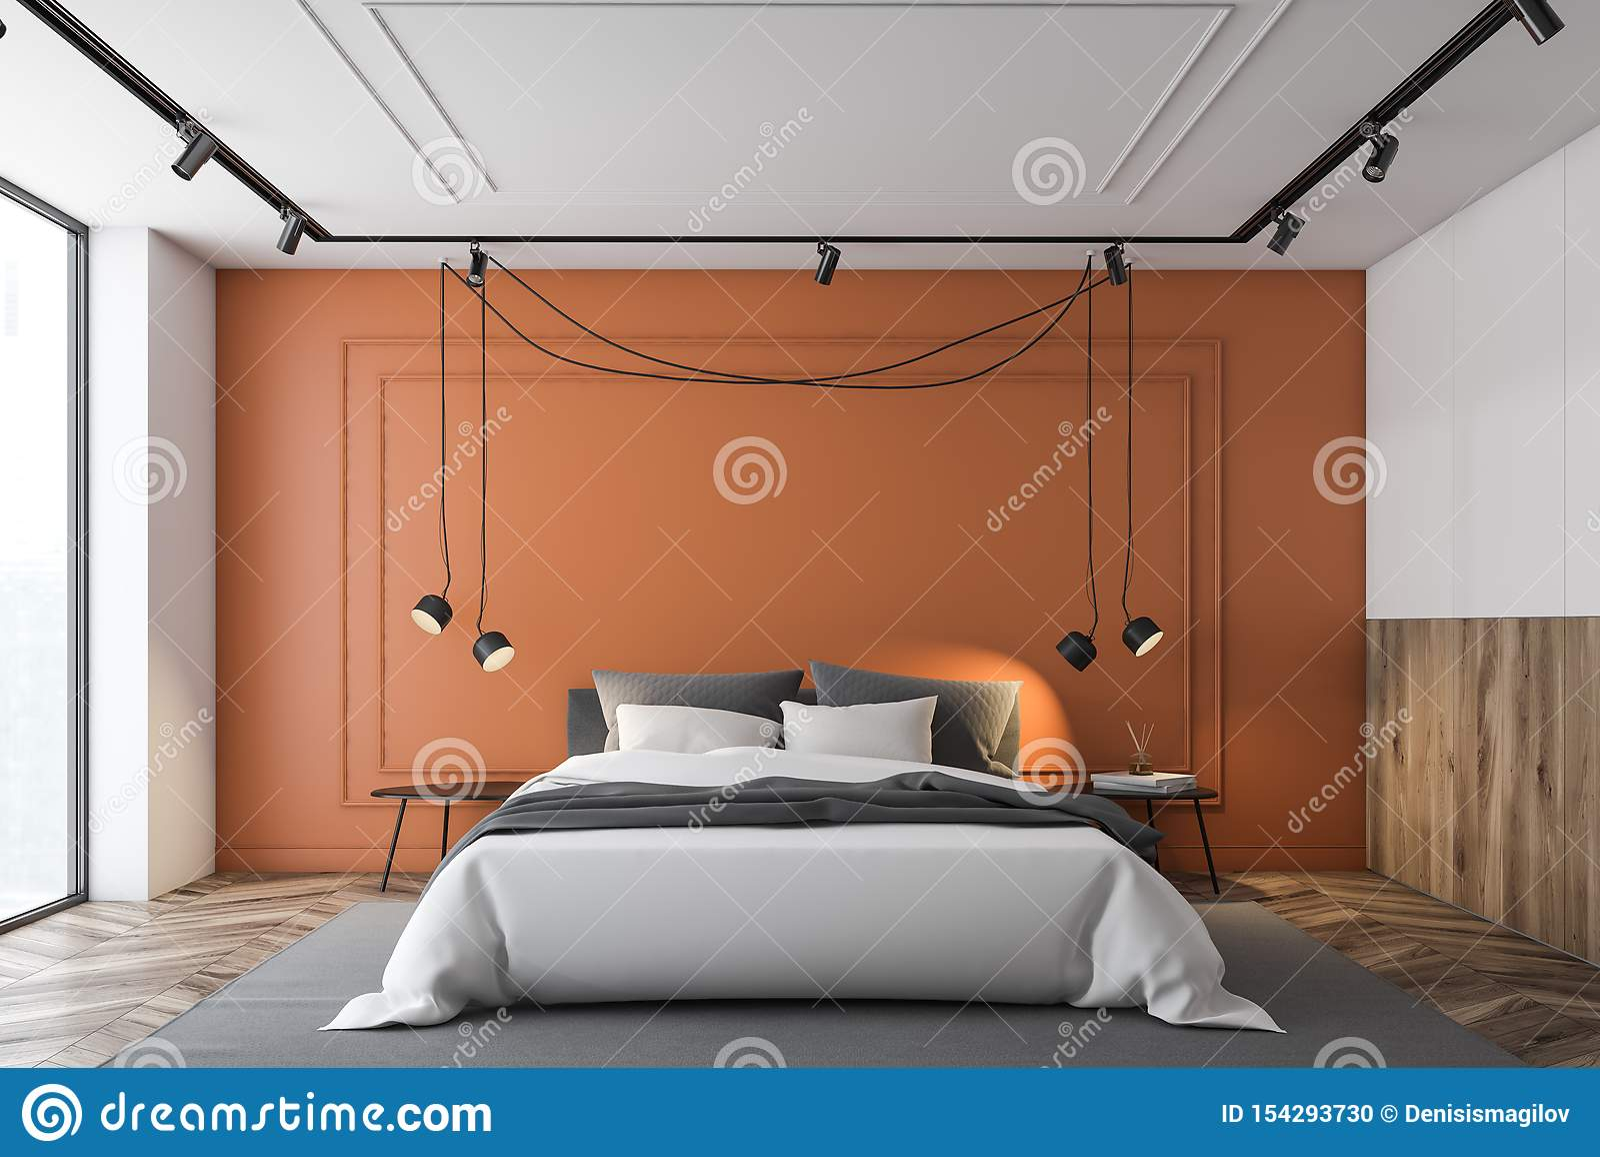 Orange And White Master Bedroom Interior Stock Illustration Illustration Of Architecture Interior 154293730